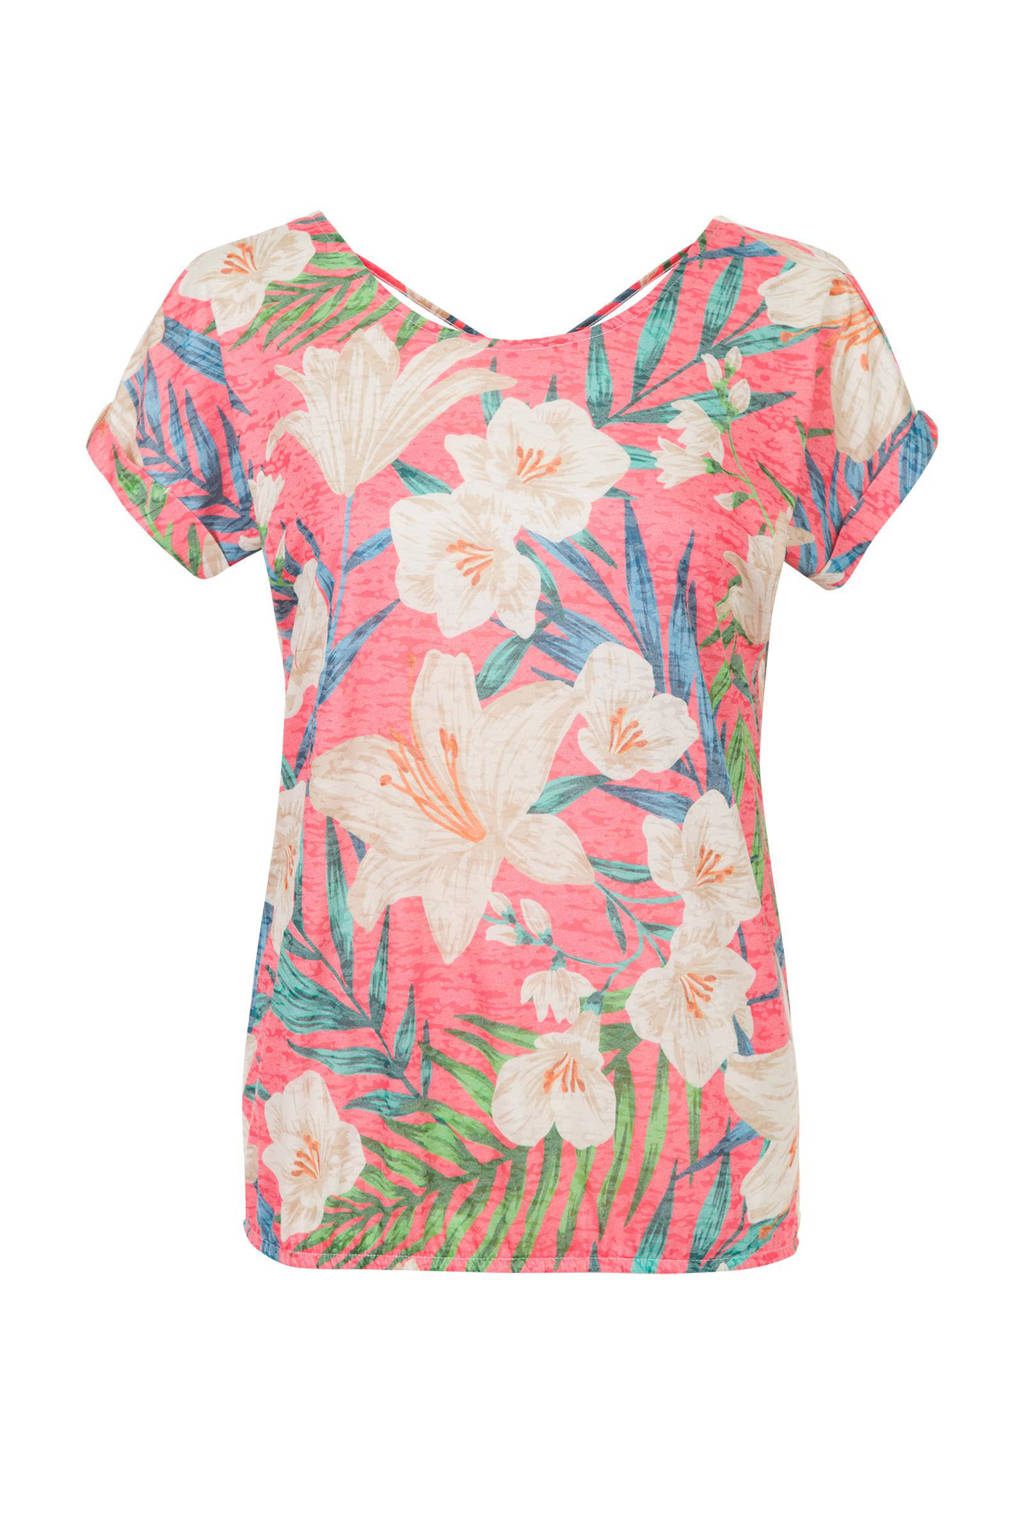 Miss Etam Regulier T-shirt met bladprint roze, Roze